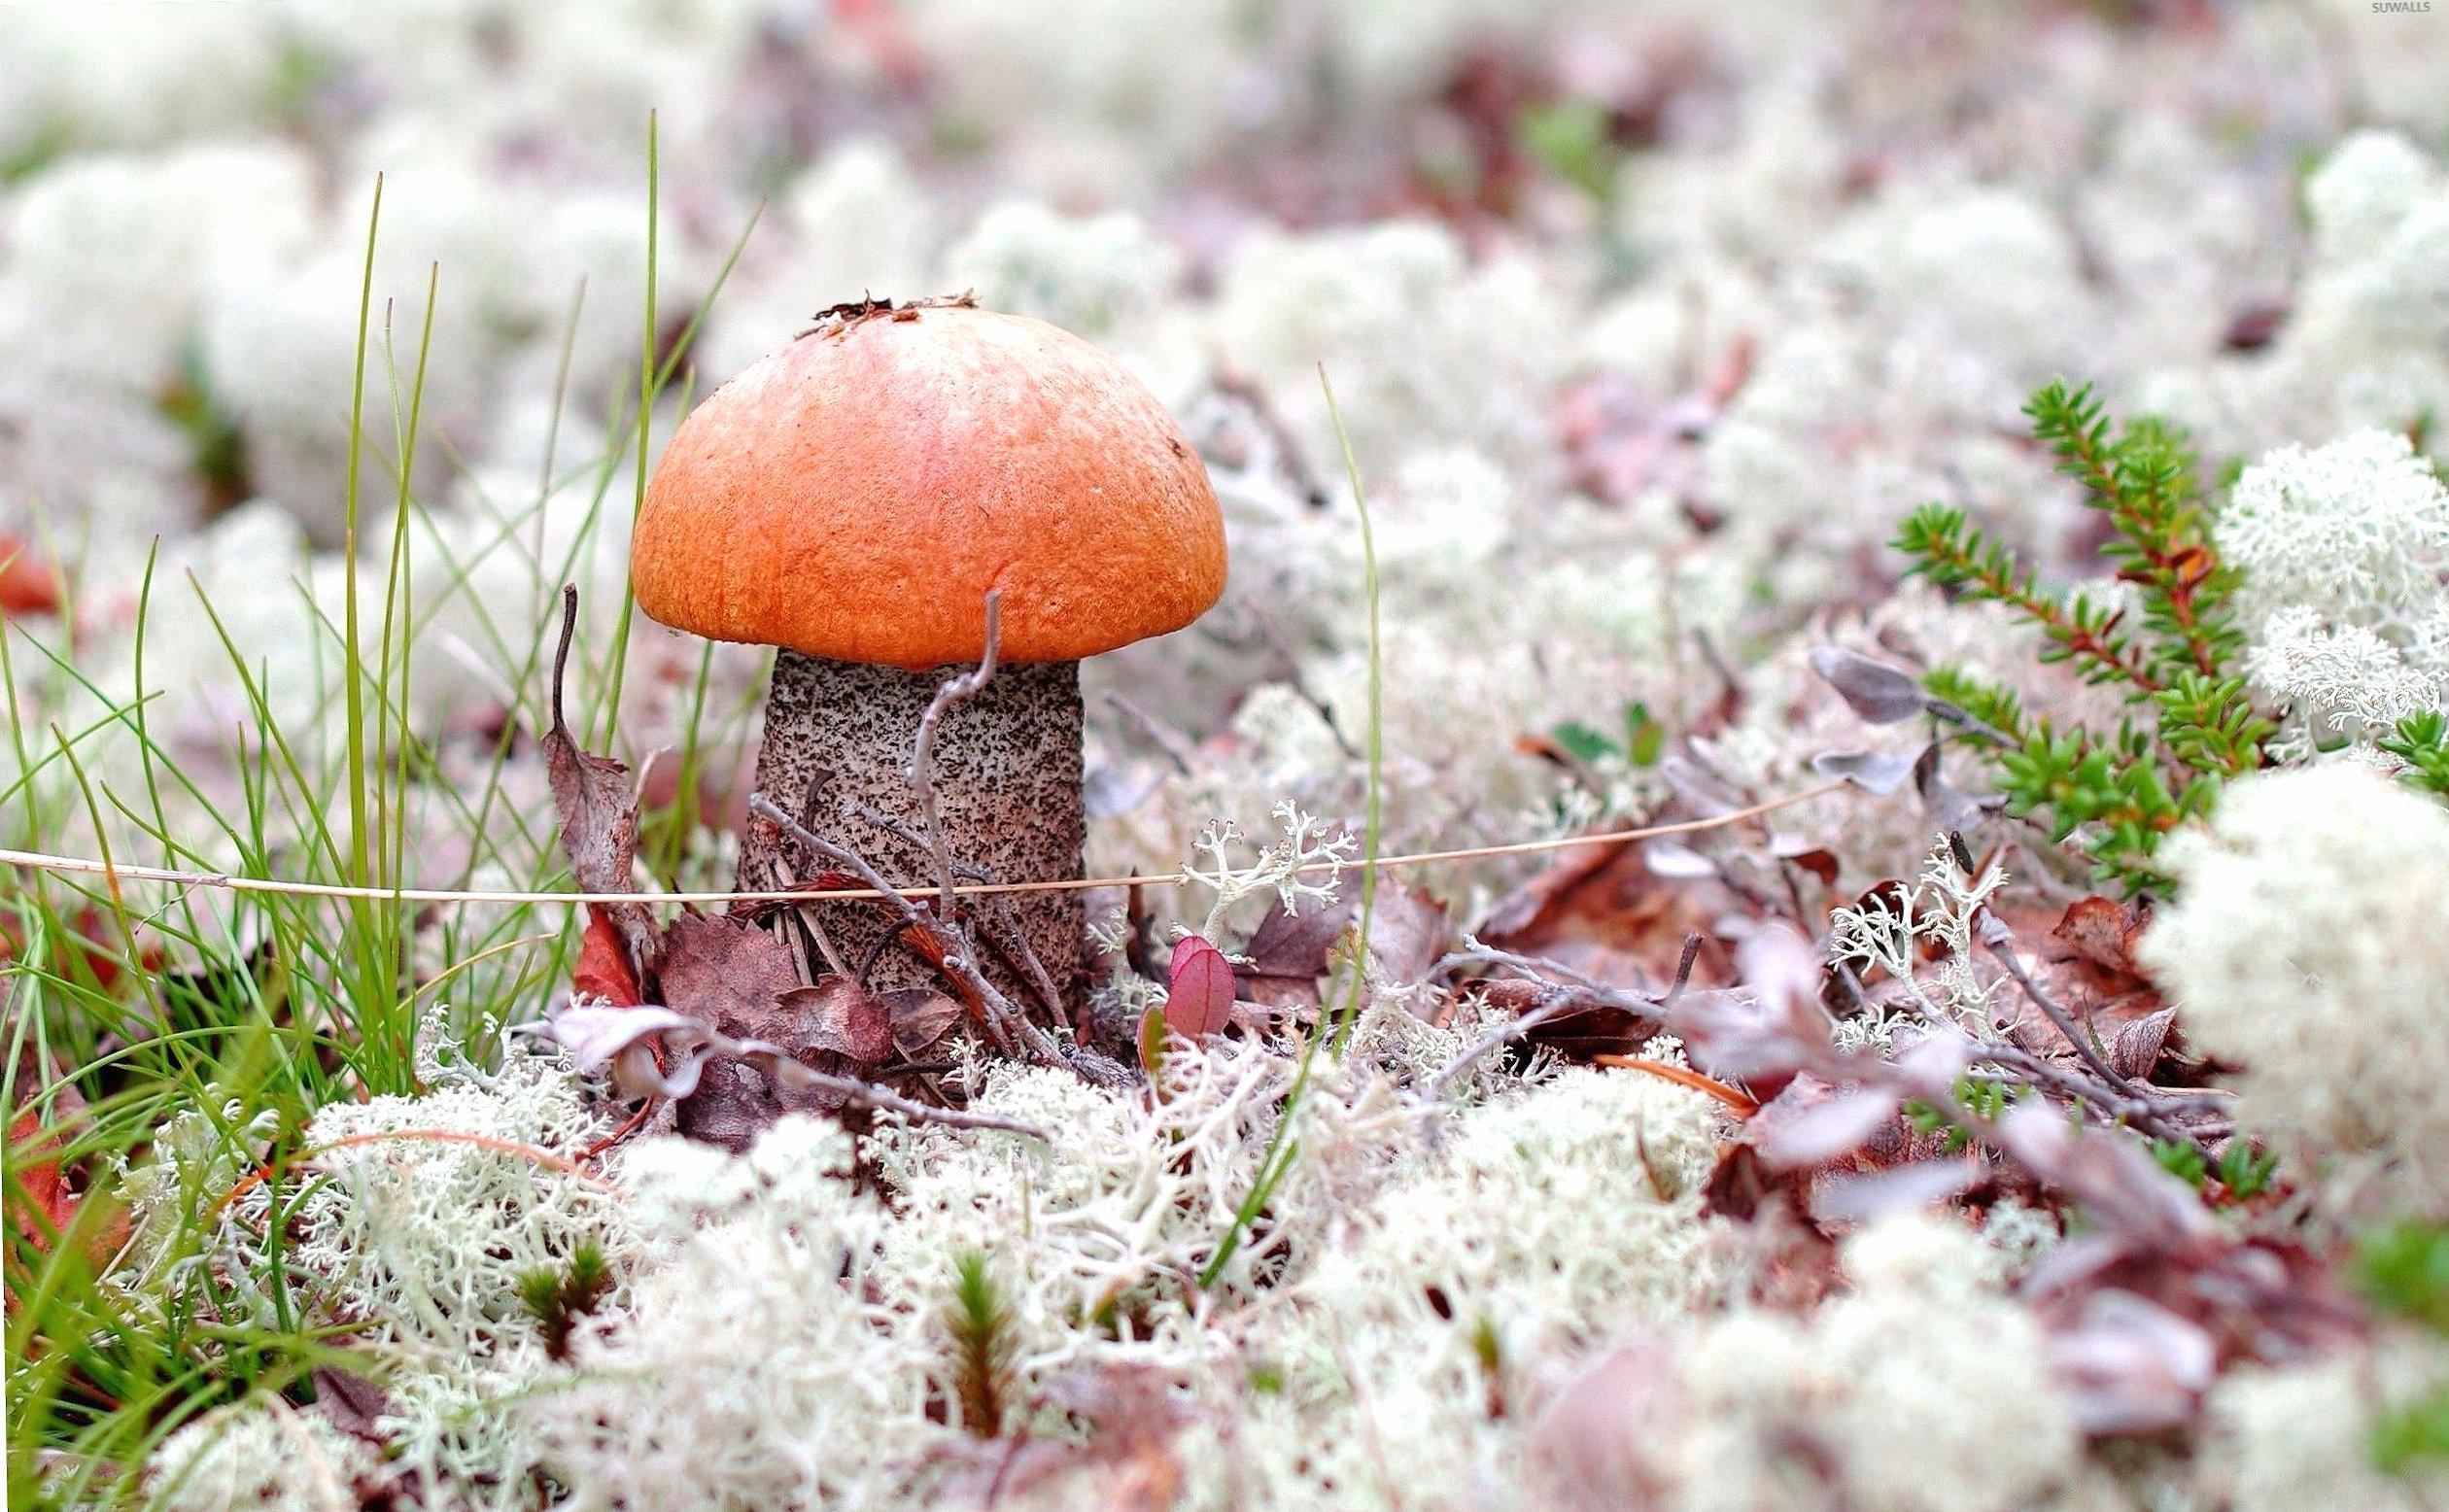 Orange mushroom rising through the autumn leaves wallpapers HD quality